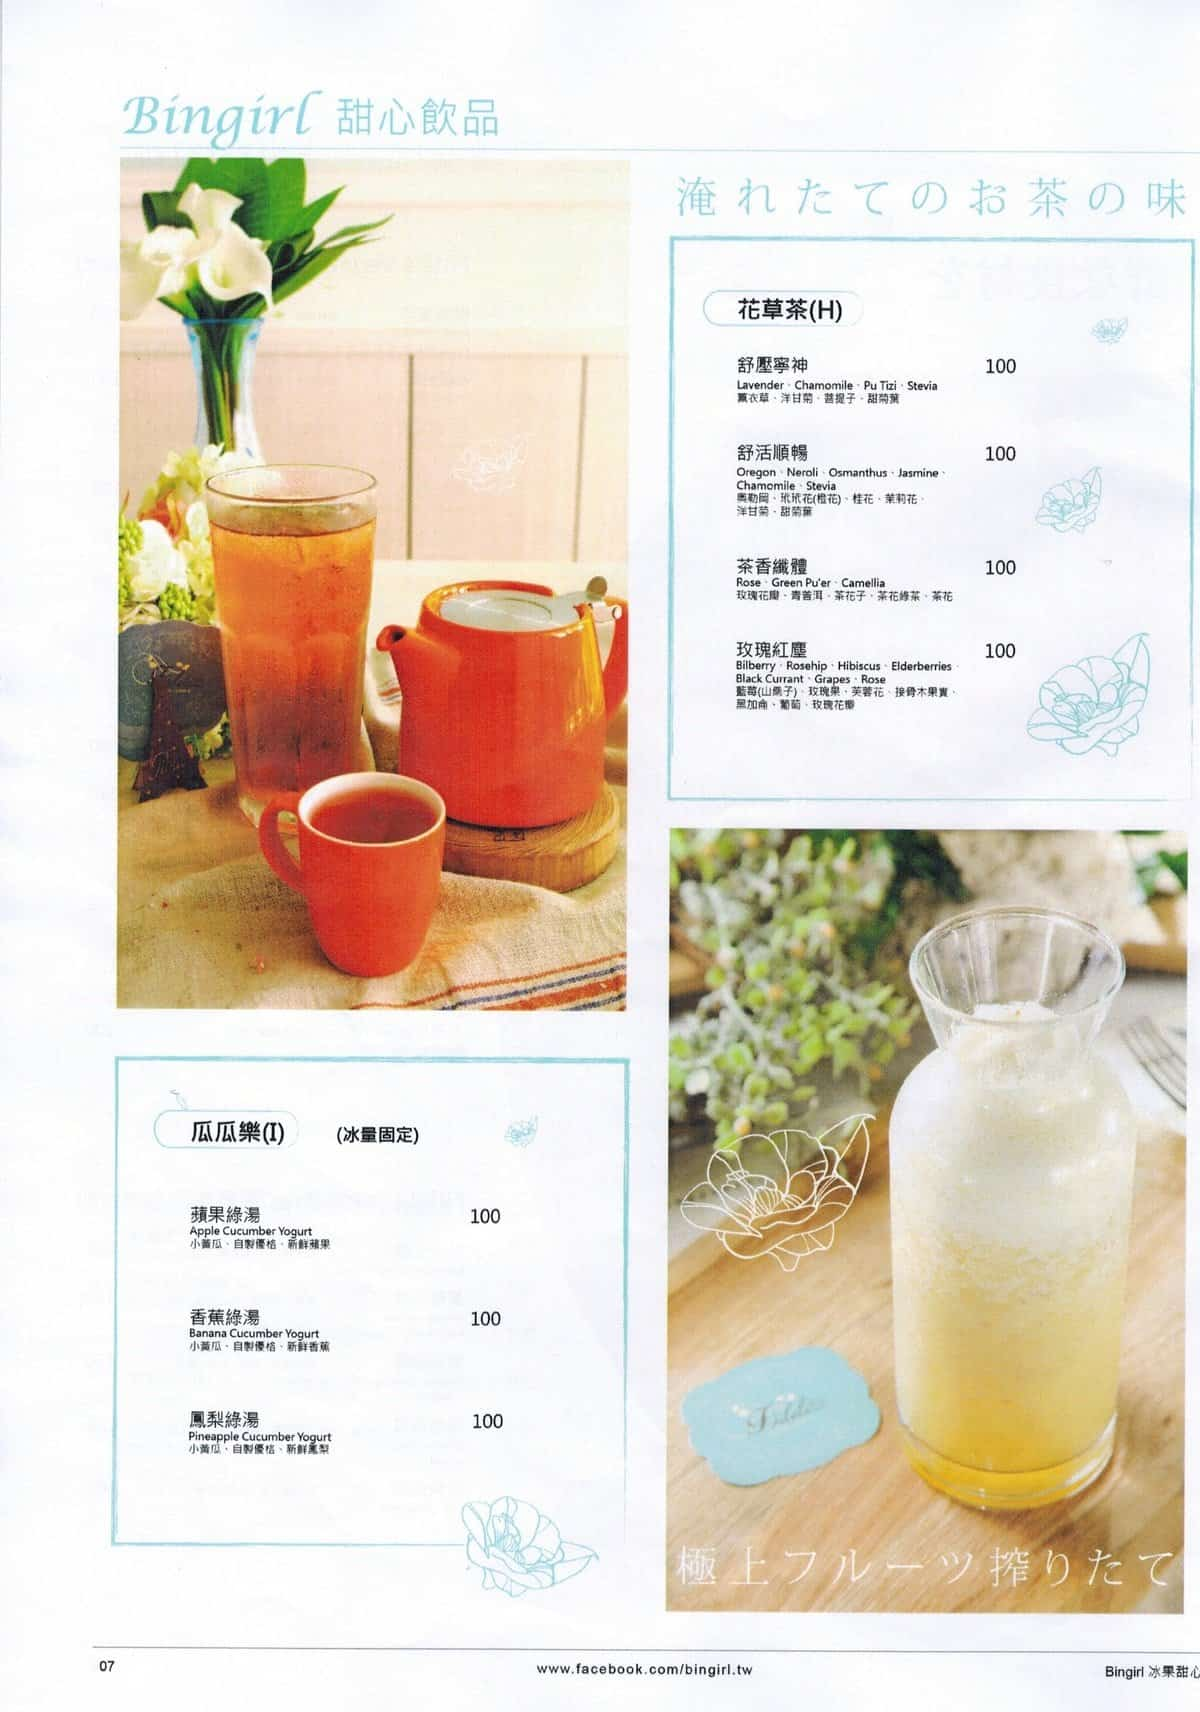 taipei-bingirl-menu8